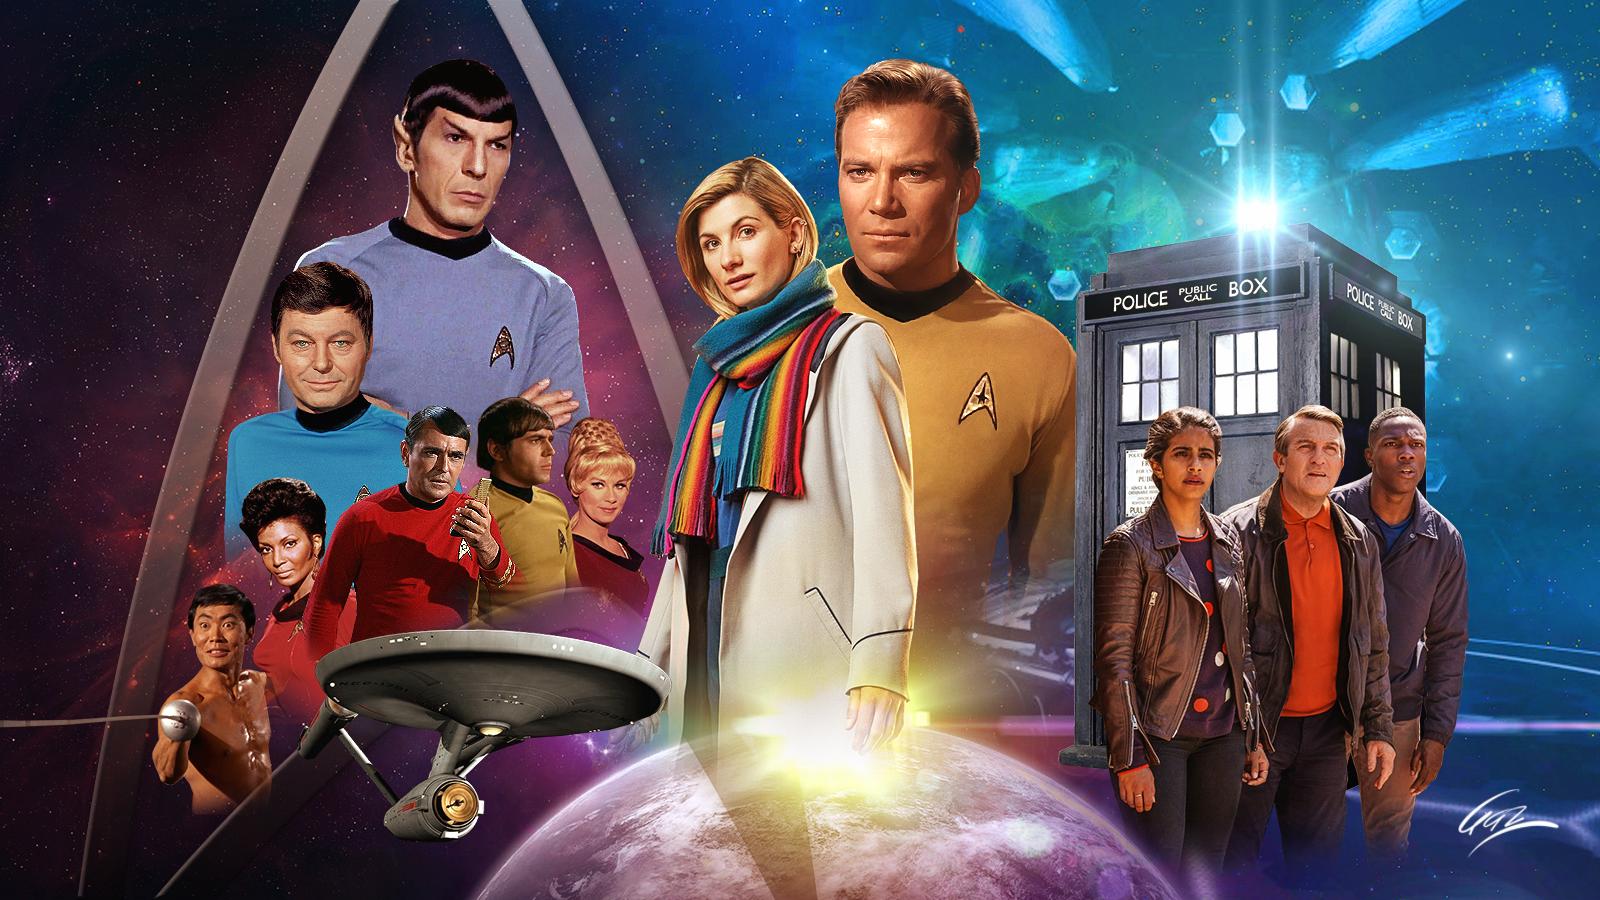 Star Trek Dr Who Wallpaper By Pzns On Deviantart